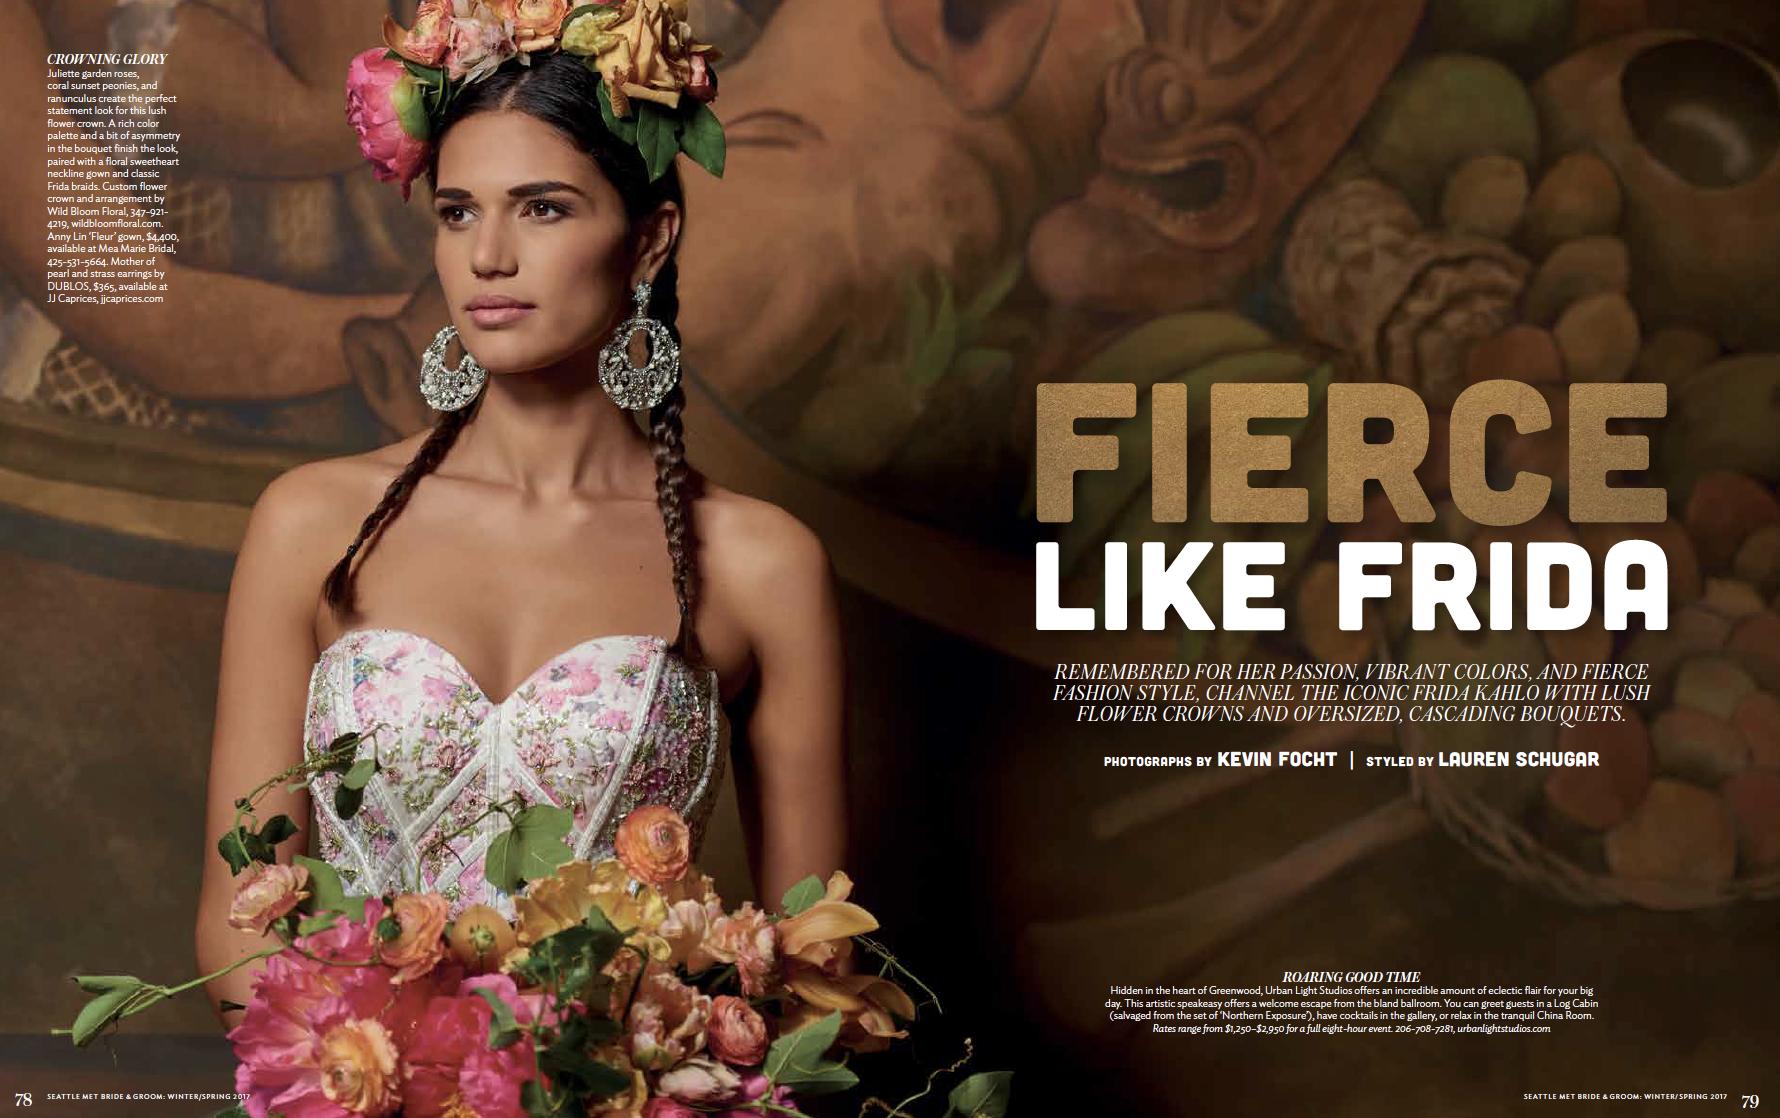 Frida Kahlo fashion editorial page.png